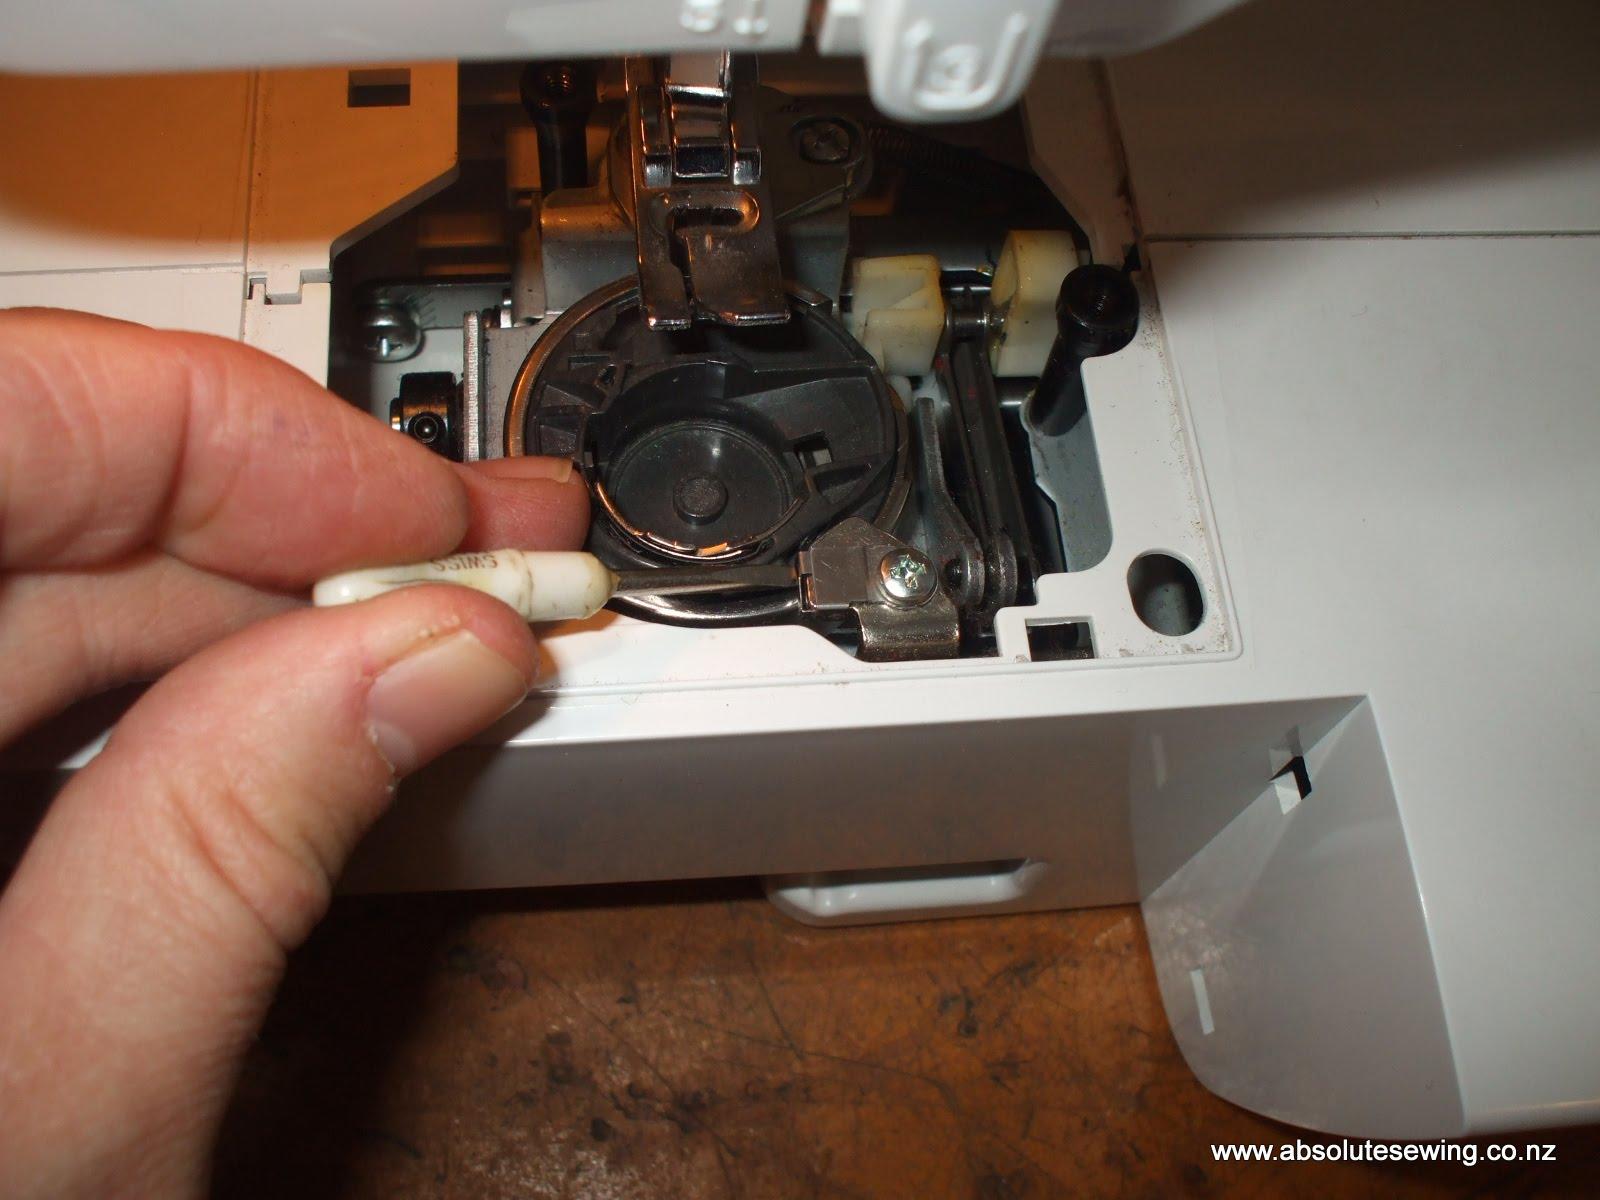 husqvarna viking service and repair husqvarna viking manual online husqvarna viking sewing machine manual